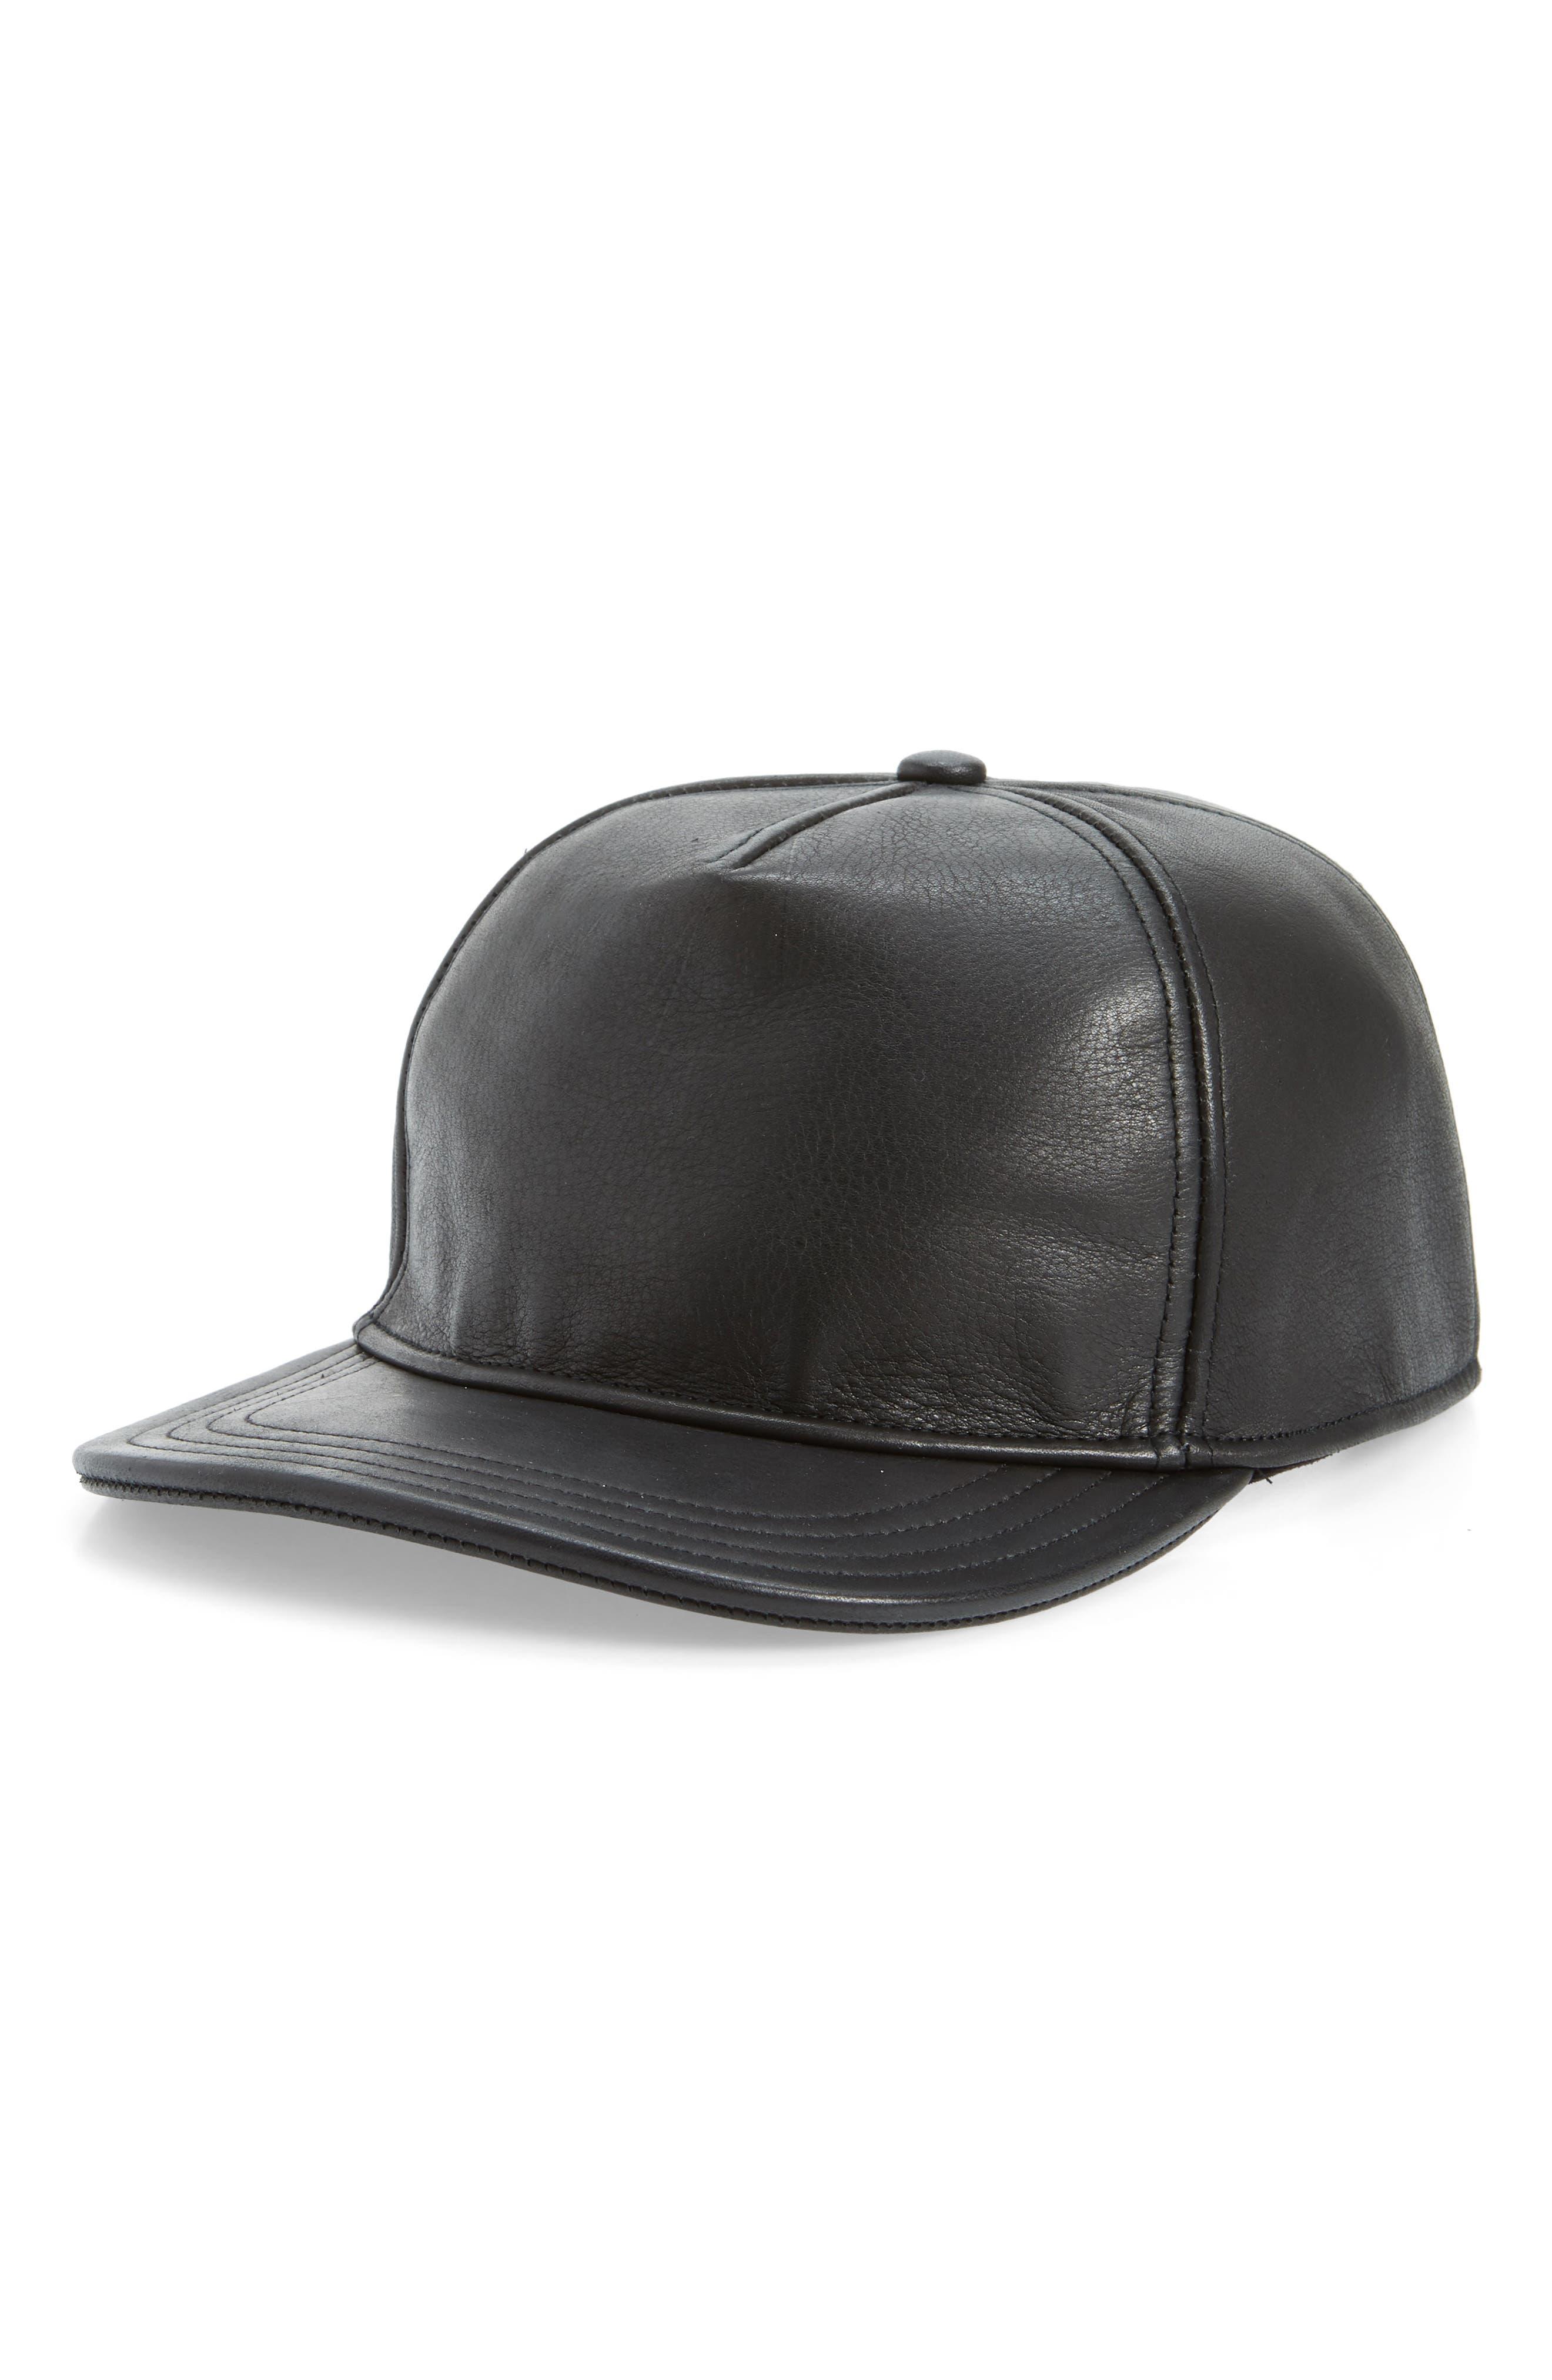 Corner Pocket Leather Baseball Cap,                             Main thumbnail 1, color,                             BLACK